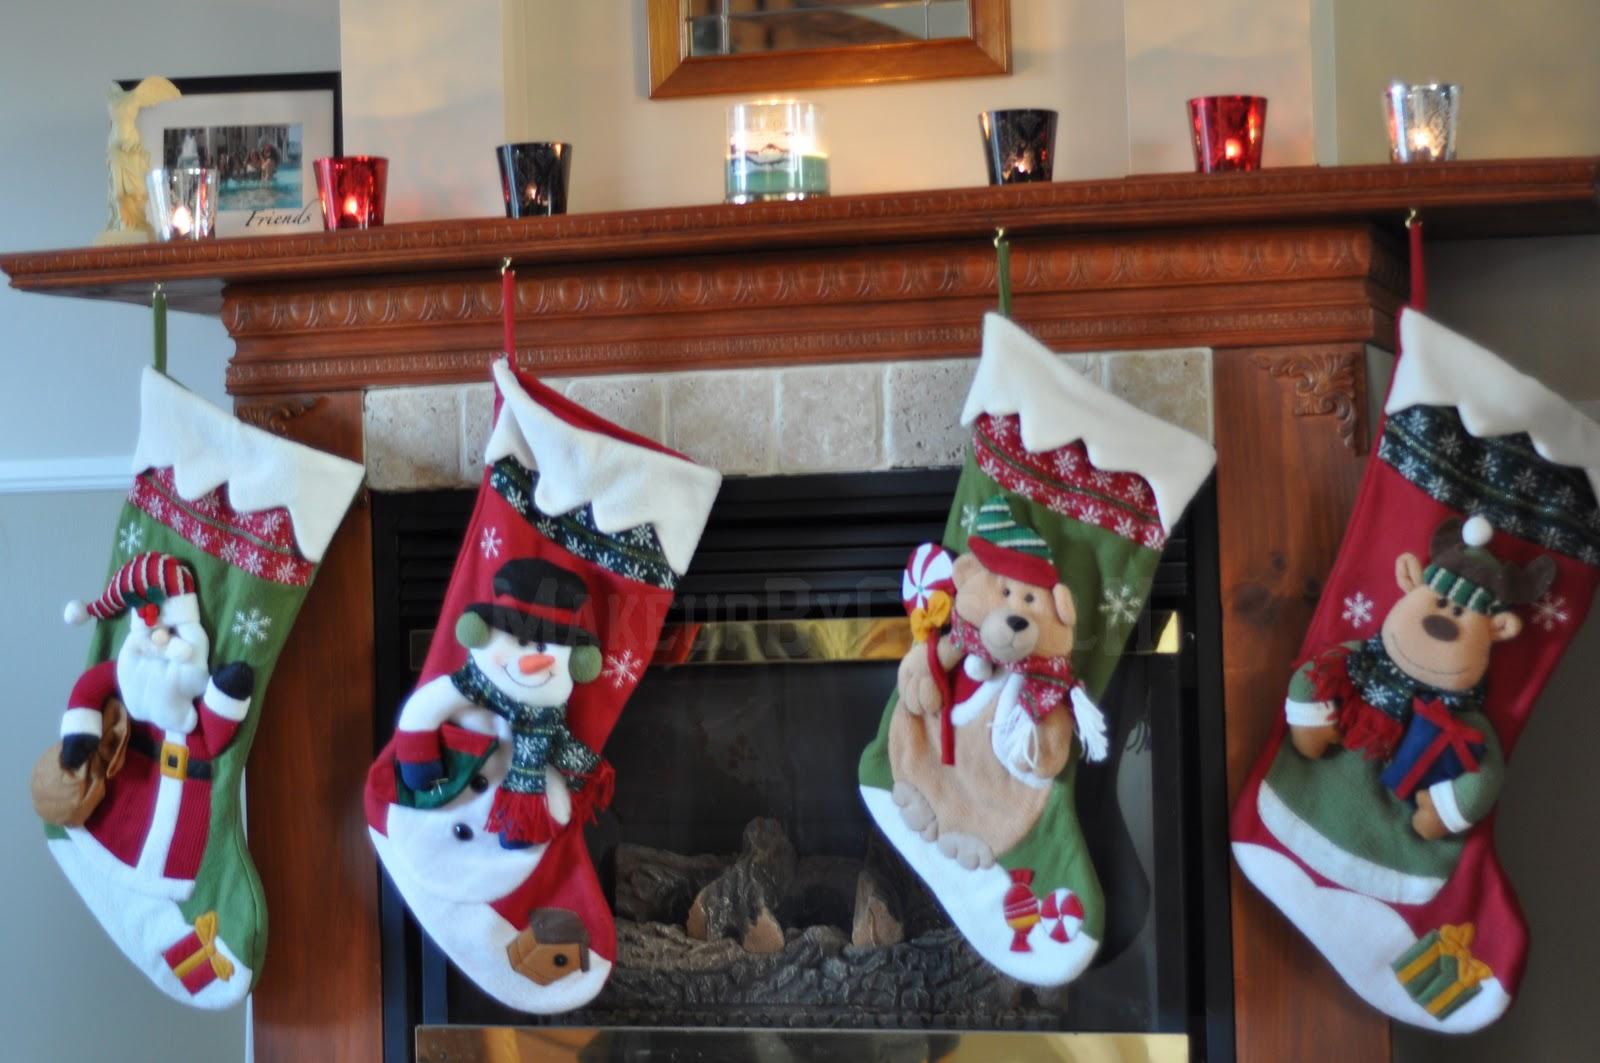 http://1.bp.blogspot.com/-bE1VcIf9Sqs/TuYWu5nIRKI/AAAAAAAAET4/Mmu7vGiNI9E/s1600/stockings%2B005%2Bcopy.jpg